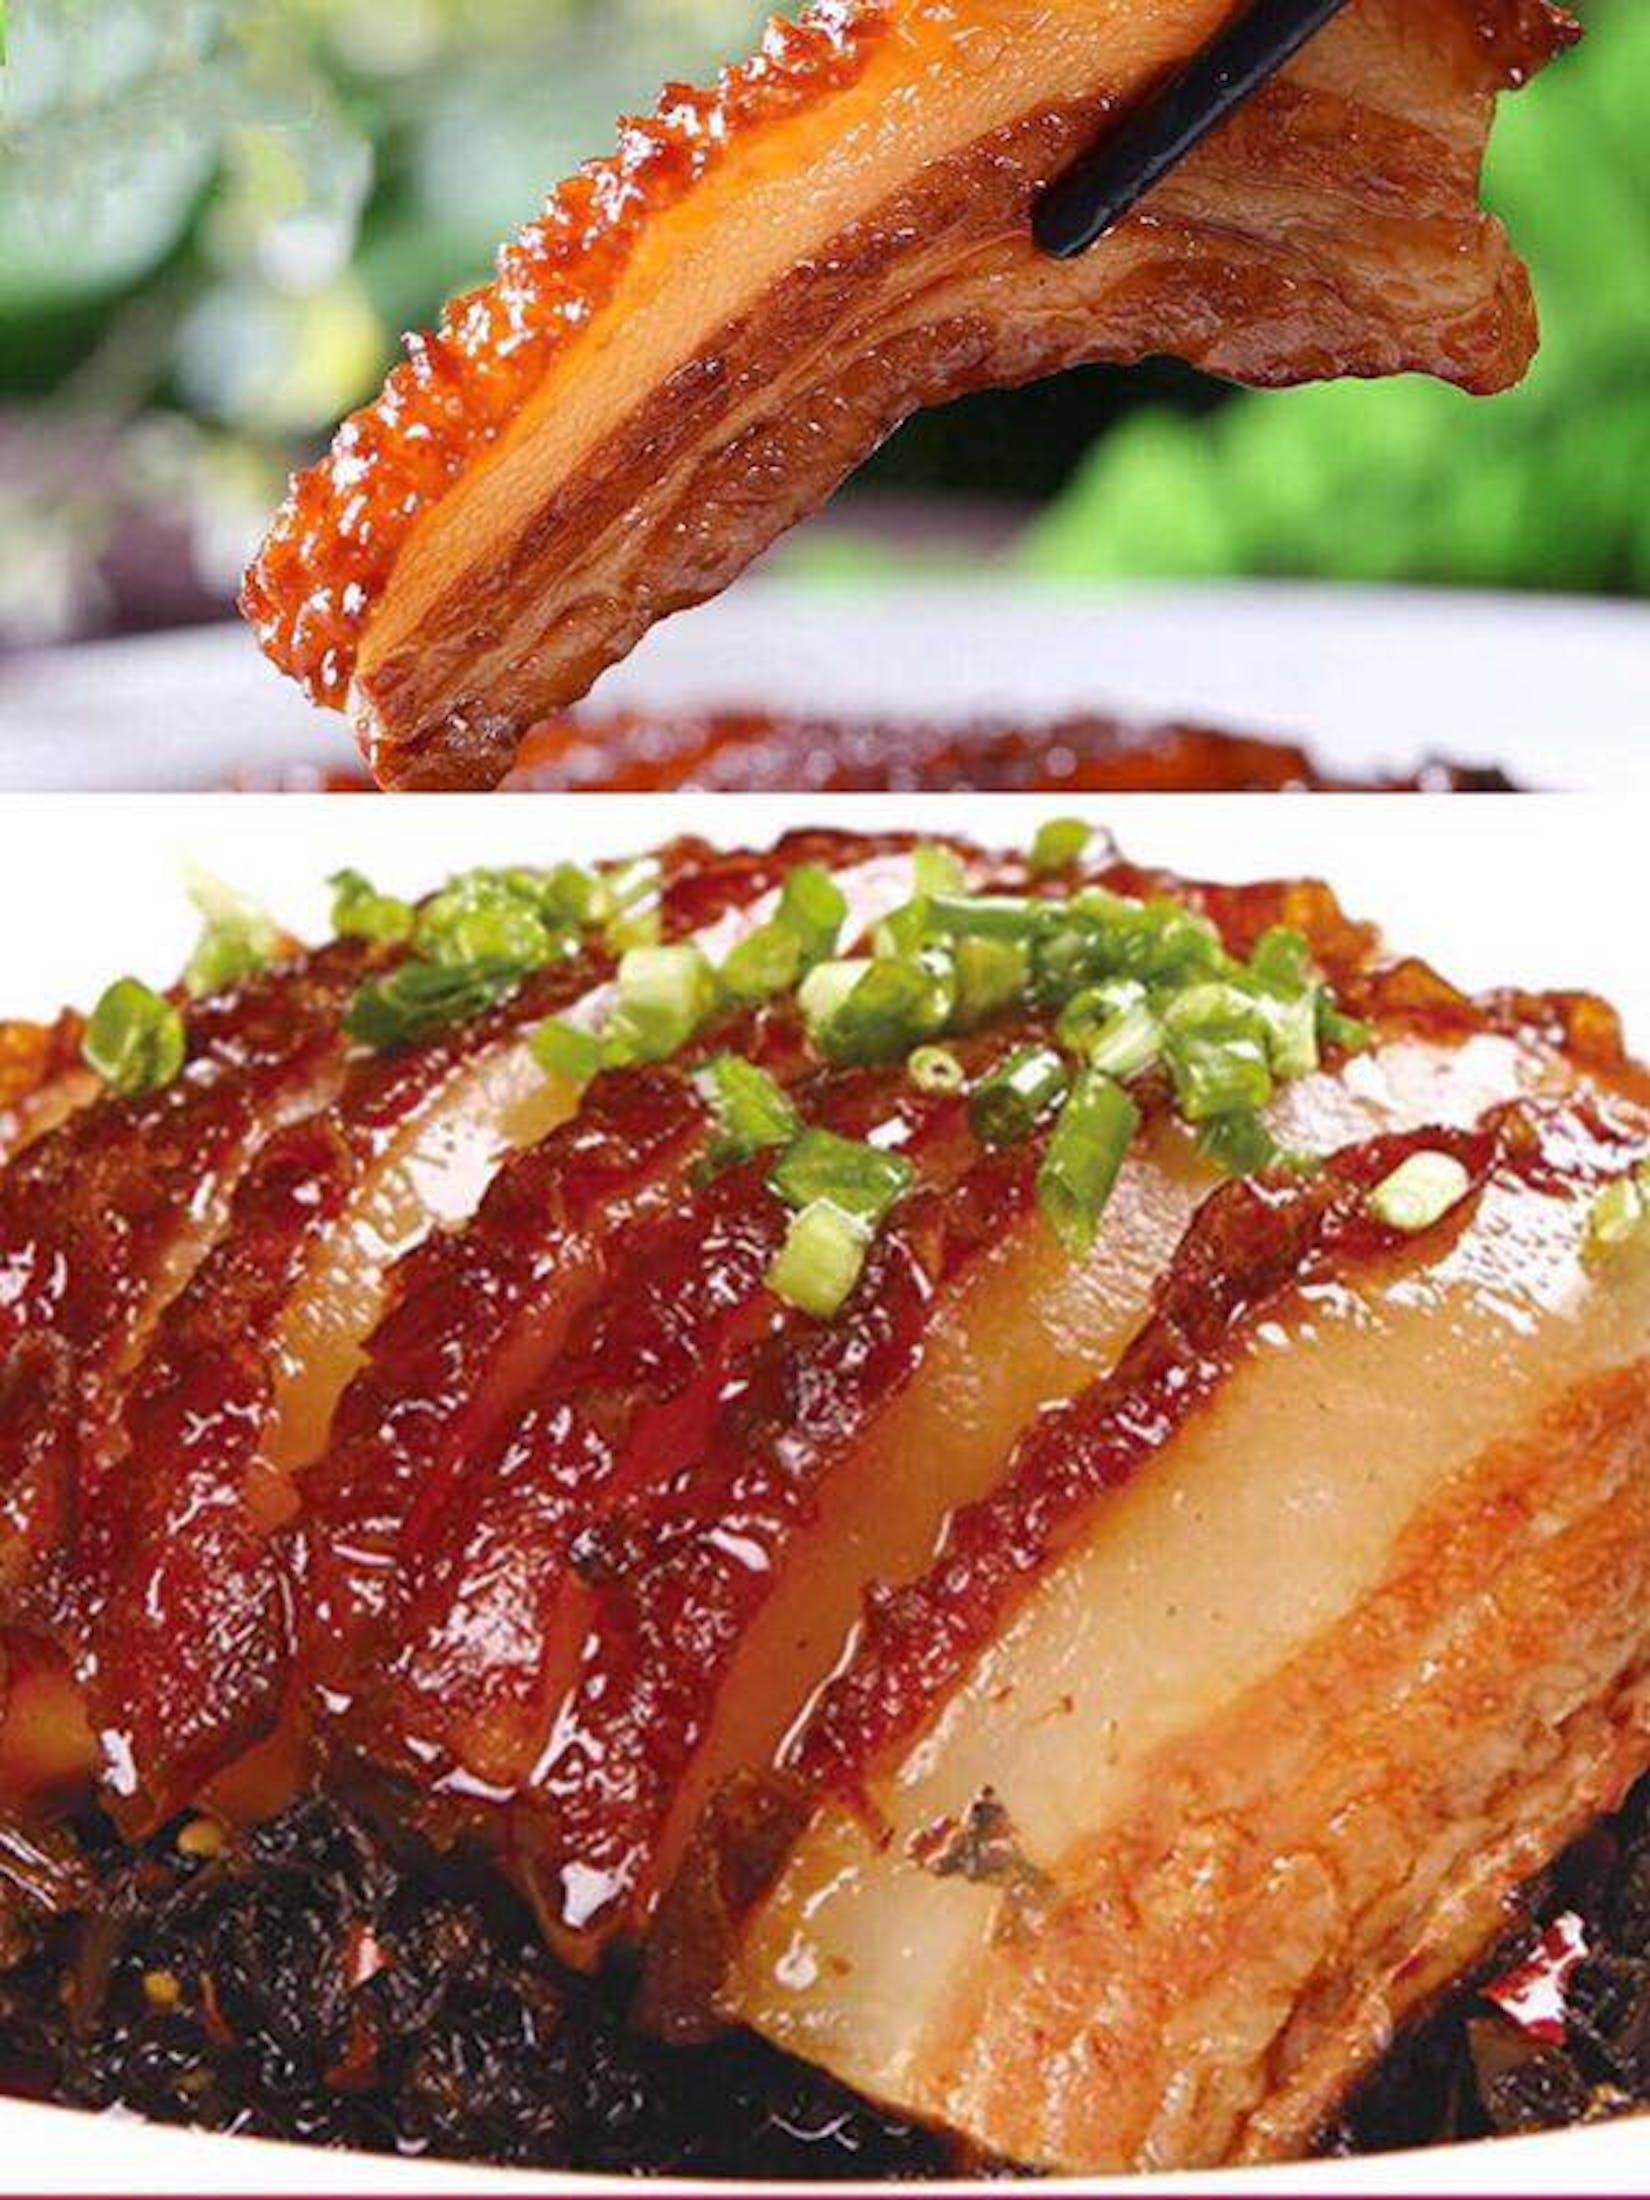 Shwe One One BBQ and Restaurant | yathar